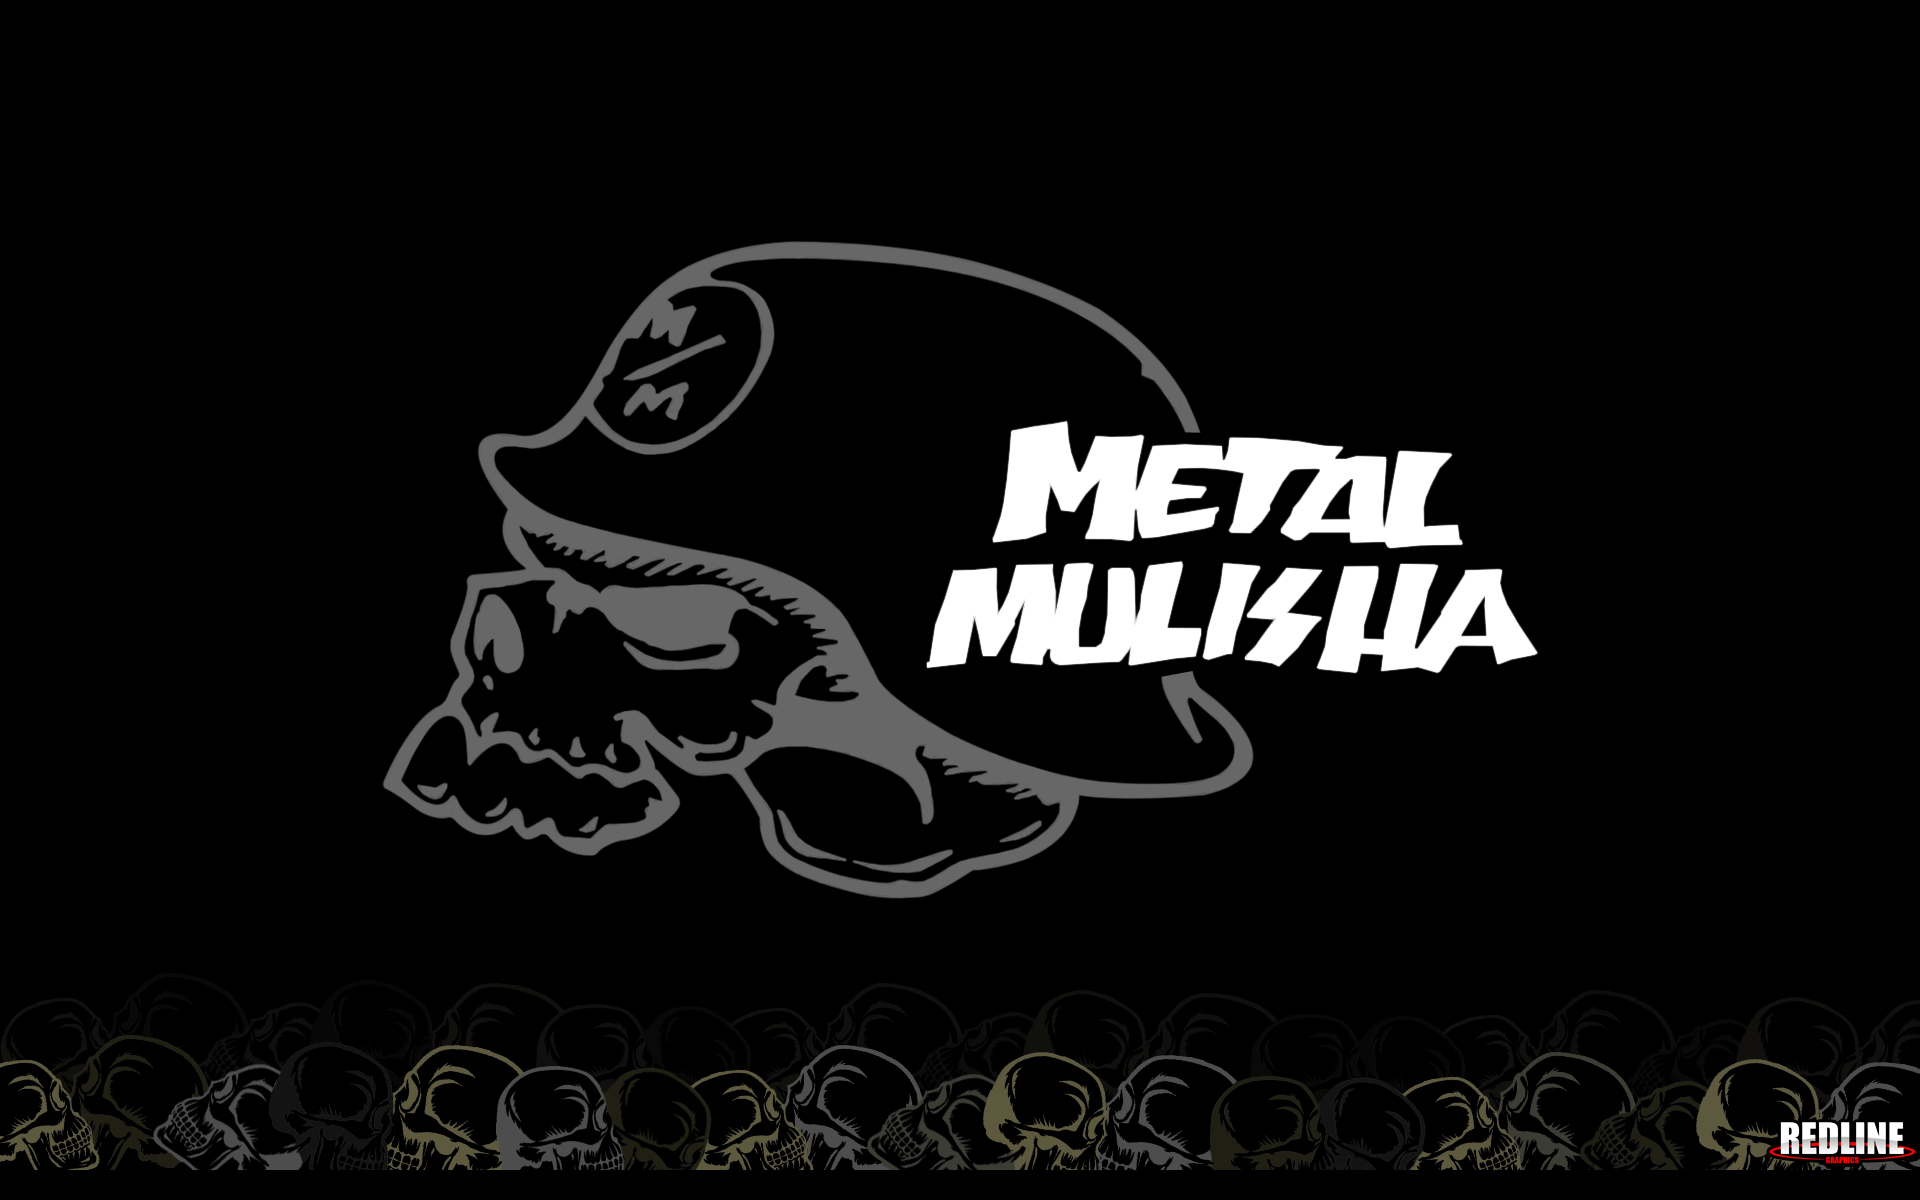 metal mulisha redline gfx by crf450ryda on deviantart